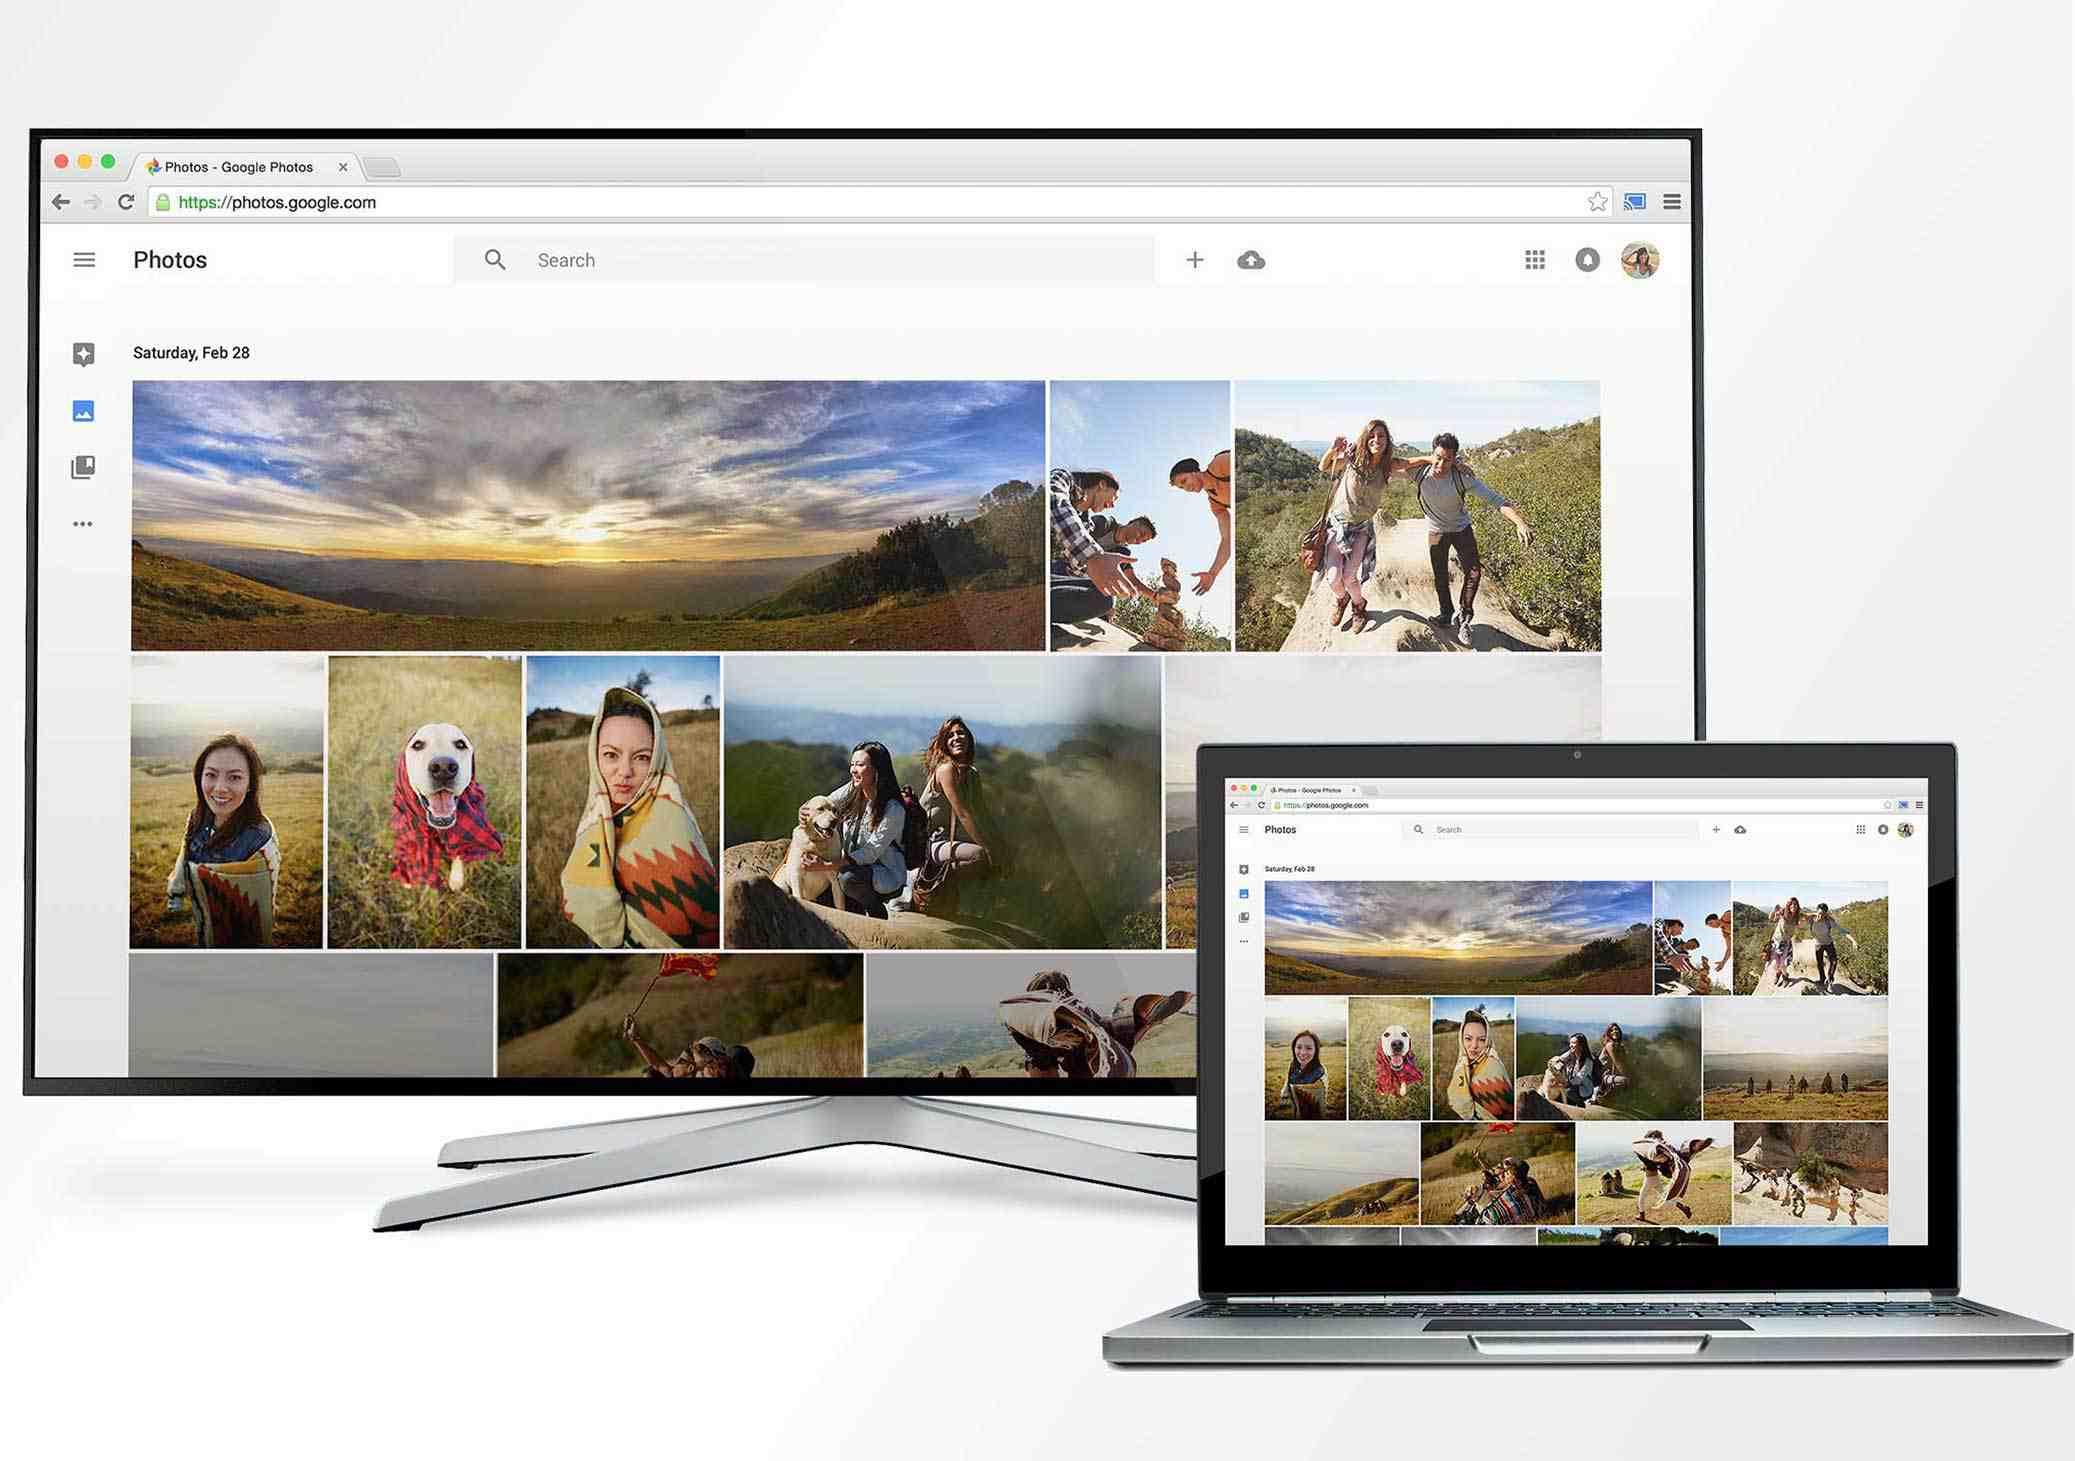 How to Display Windows Desktop On A TV Using Chromecast